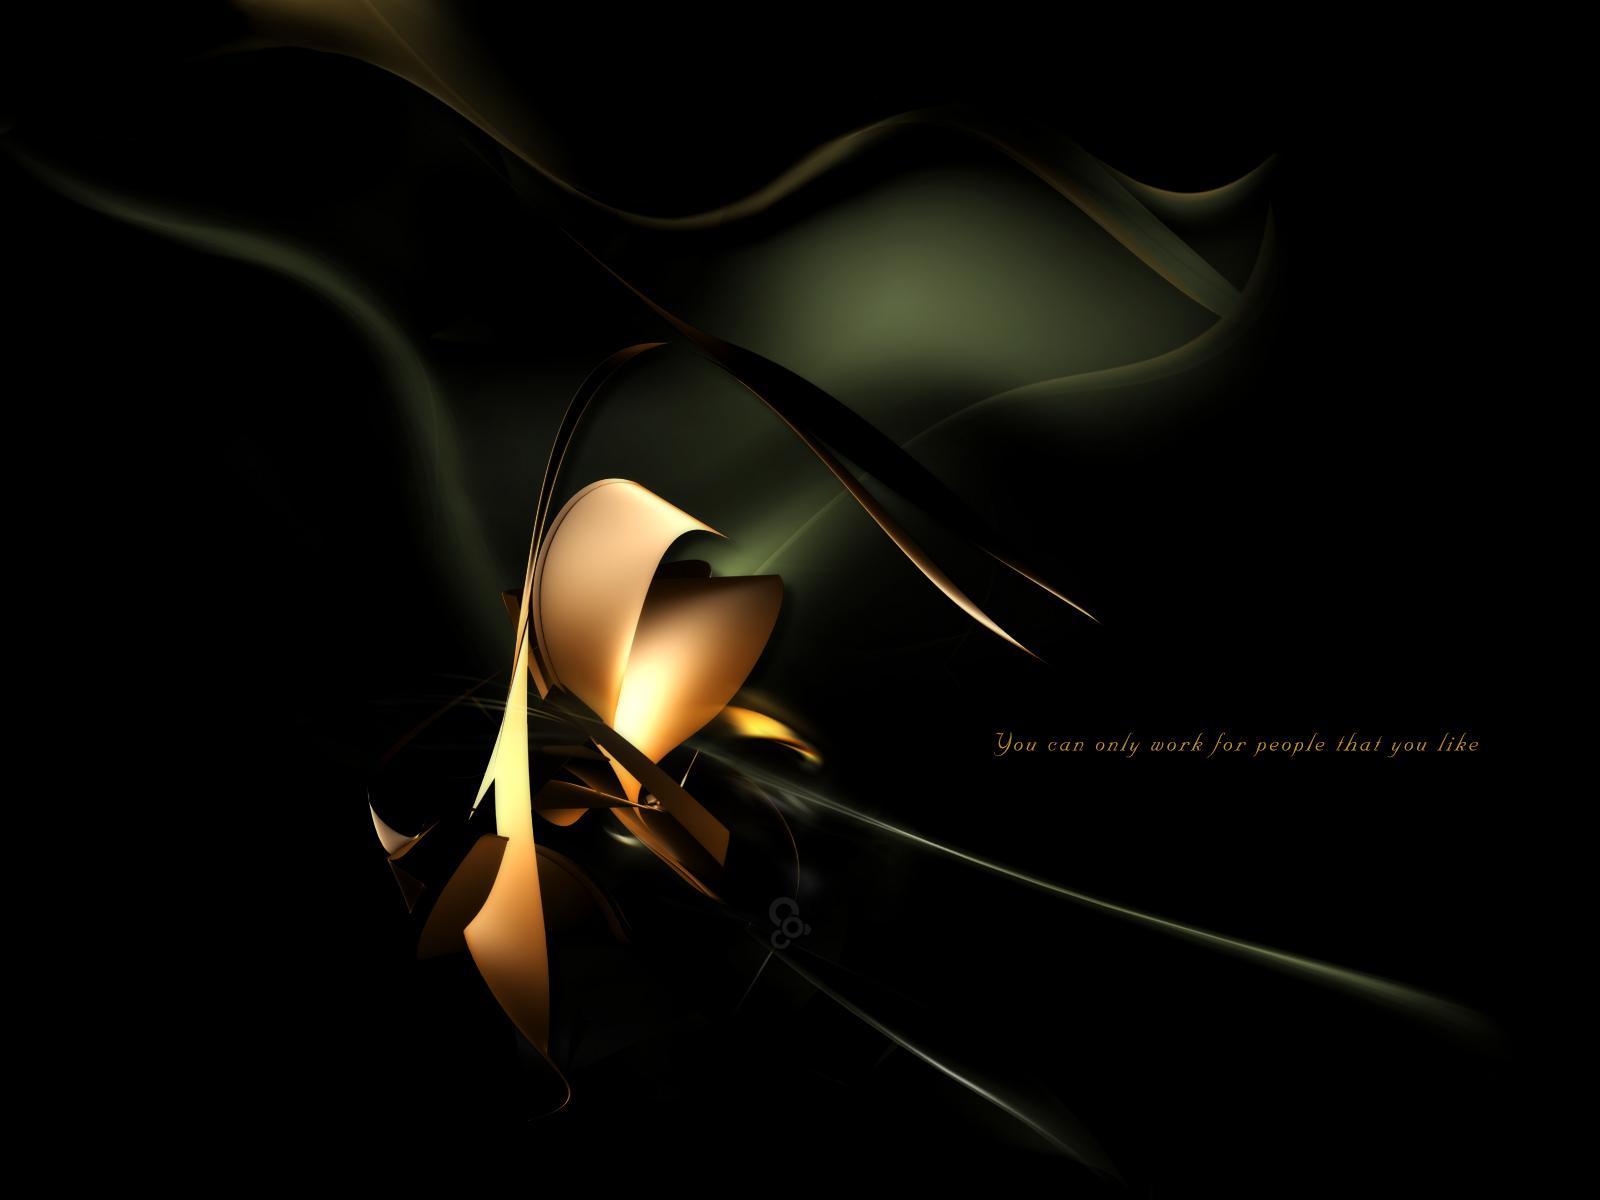 Kinds of wallpapers 3d black wallpapers for Sfondi desktop 3d